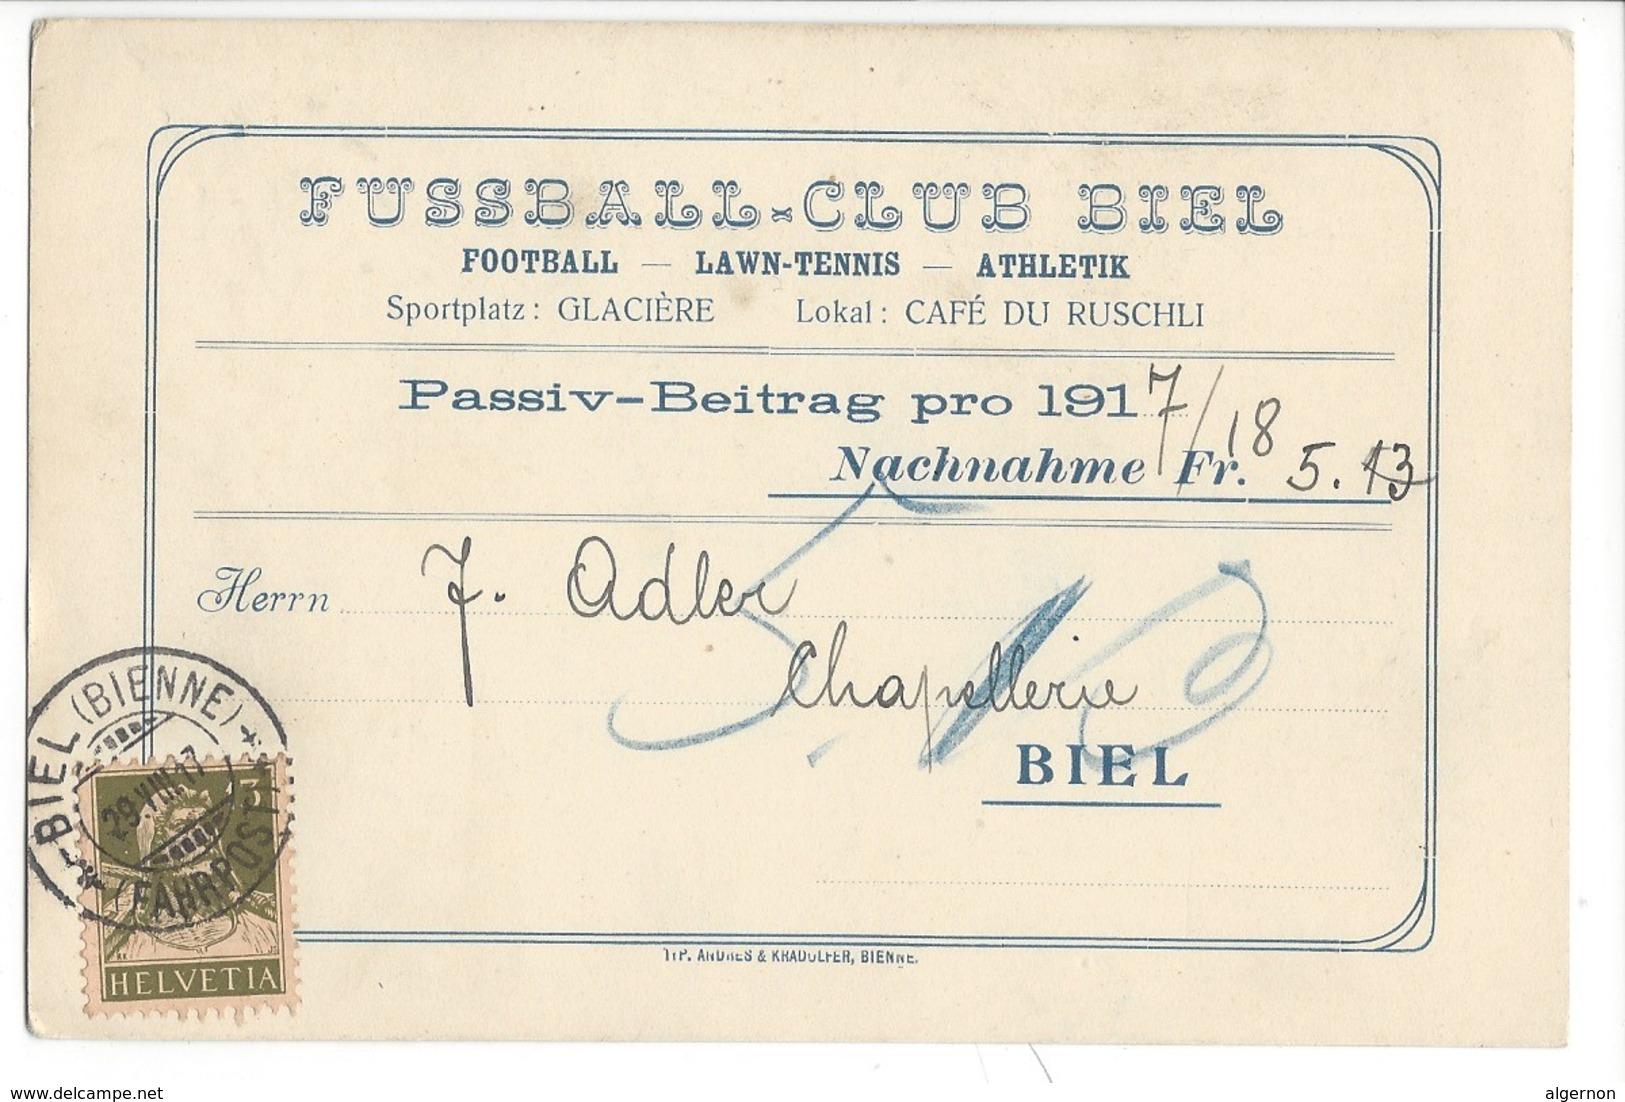 22027 - Füssball-Club Biel Lawn-Tennis Passi-Beitrag 1917 - BE Berne